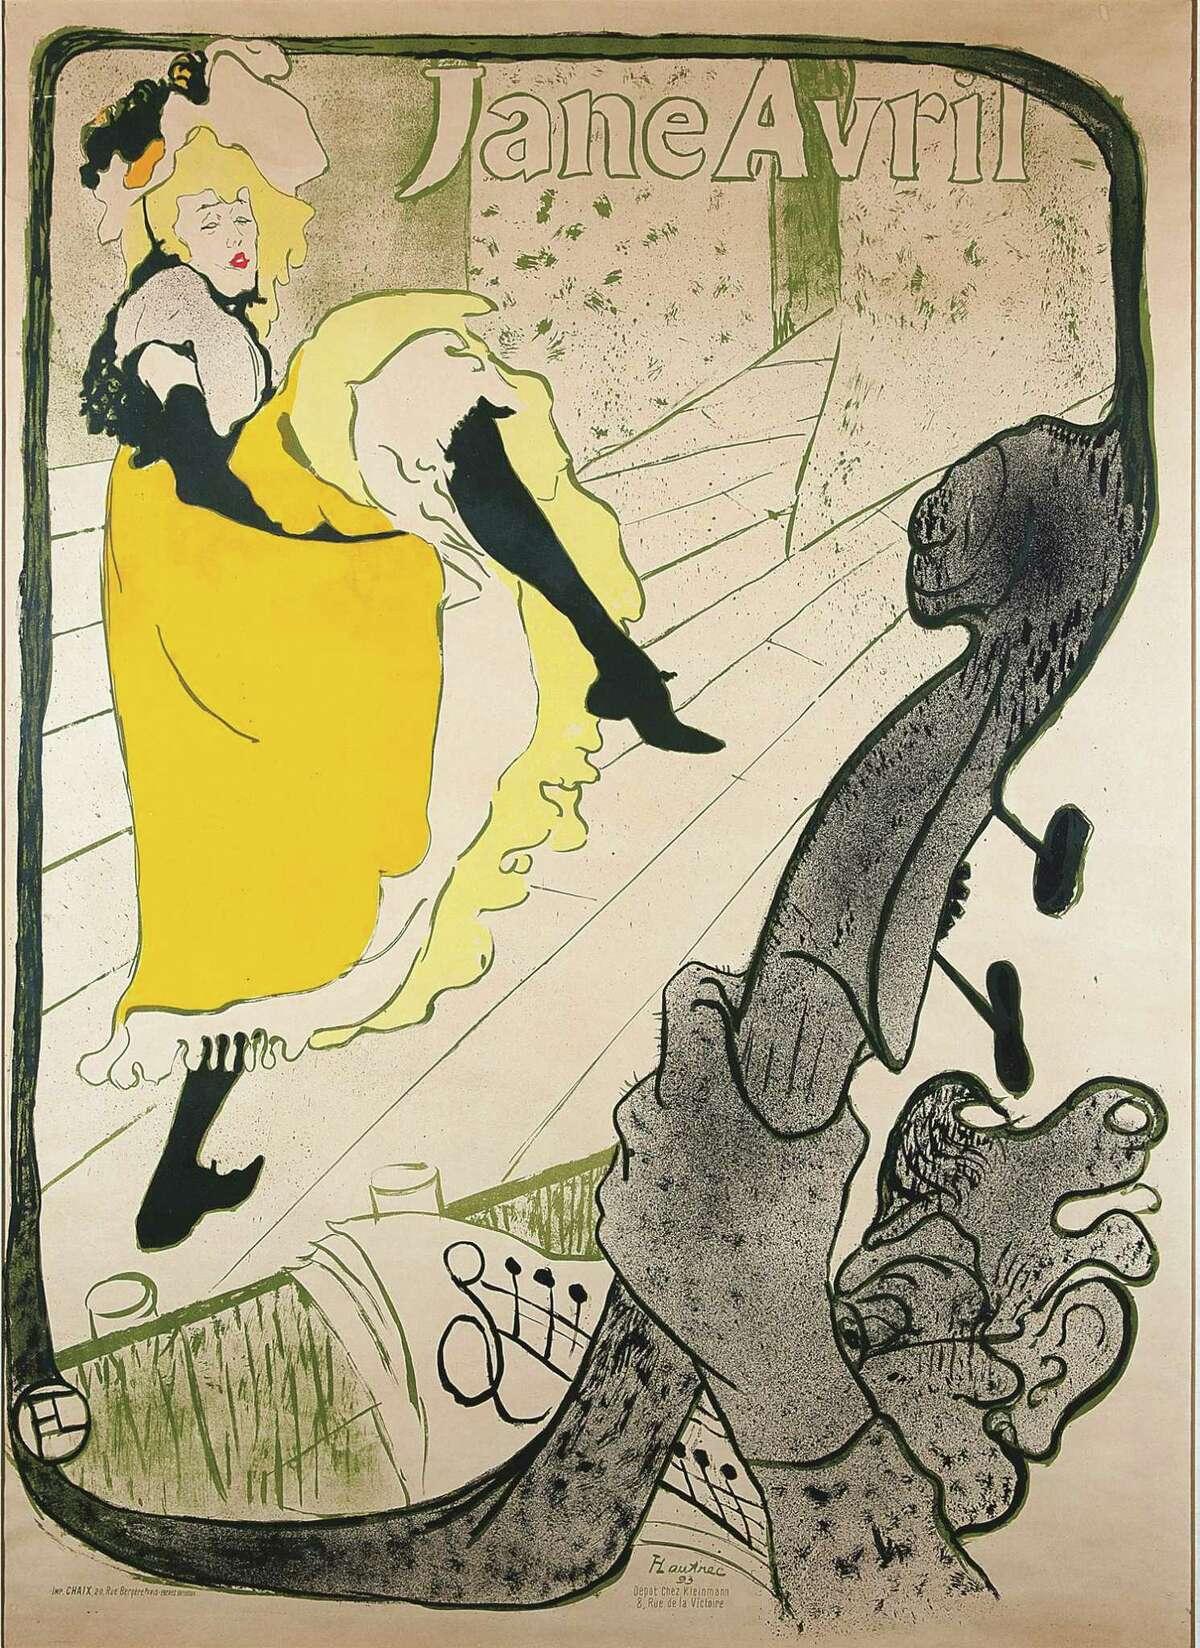 "Henri de Toulouse-Lautrec (French 1864-1901) - ""Jane Avril (Before Letters),"" 1893. Color lithograph, 1240 x 915 mm."